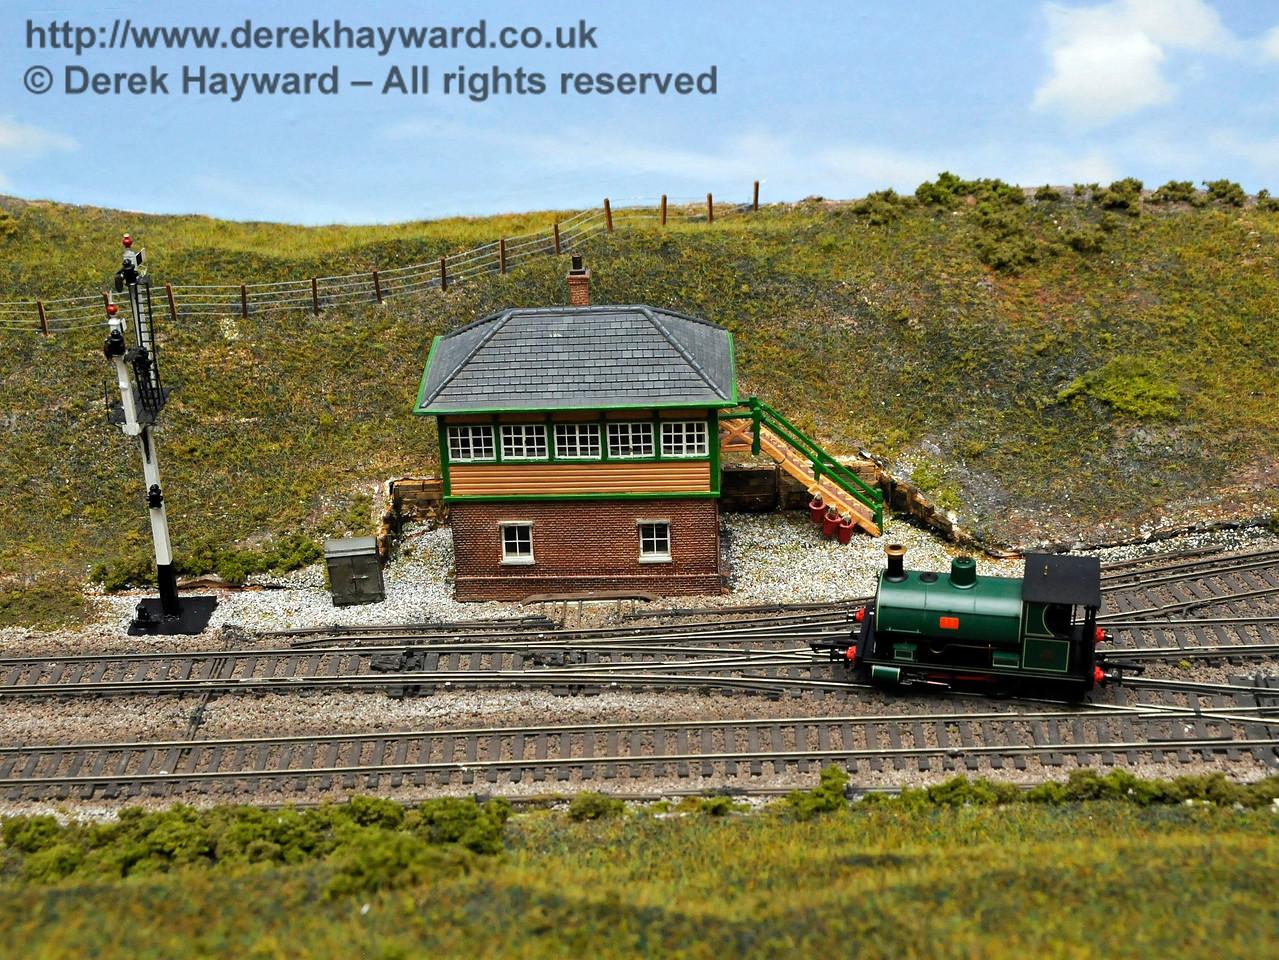 Model Railway Weekend 250517 17432 E